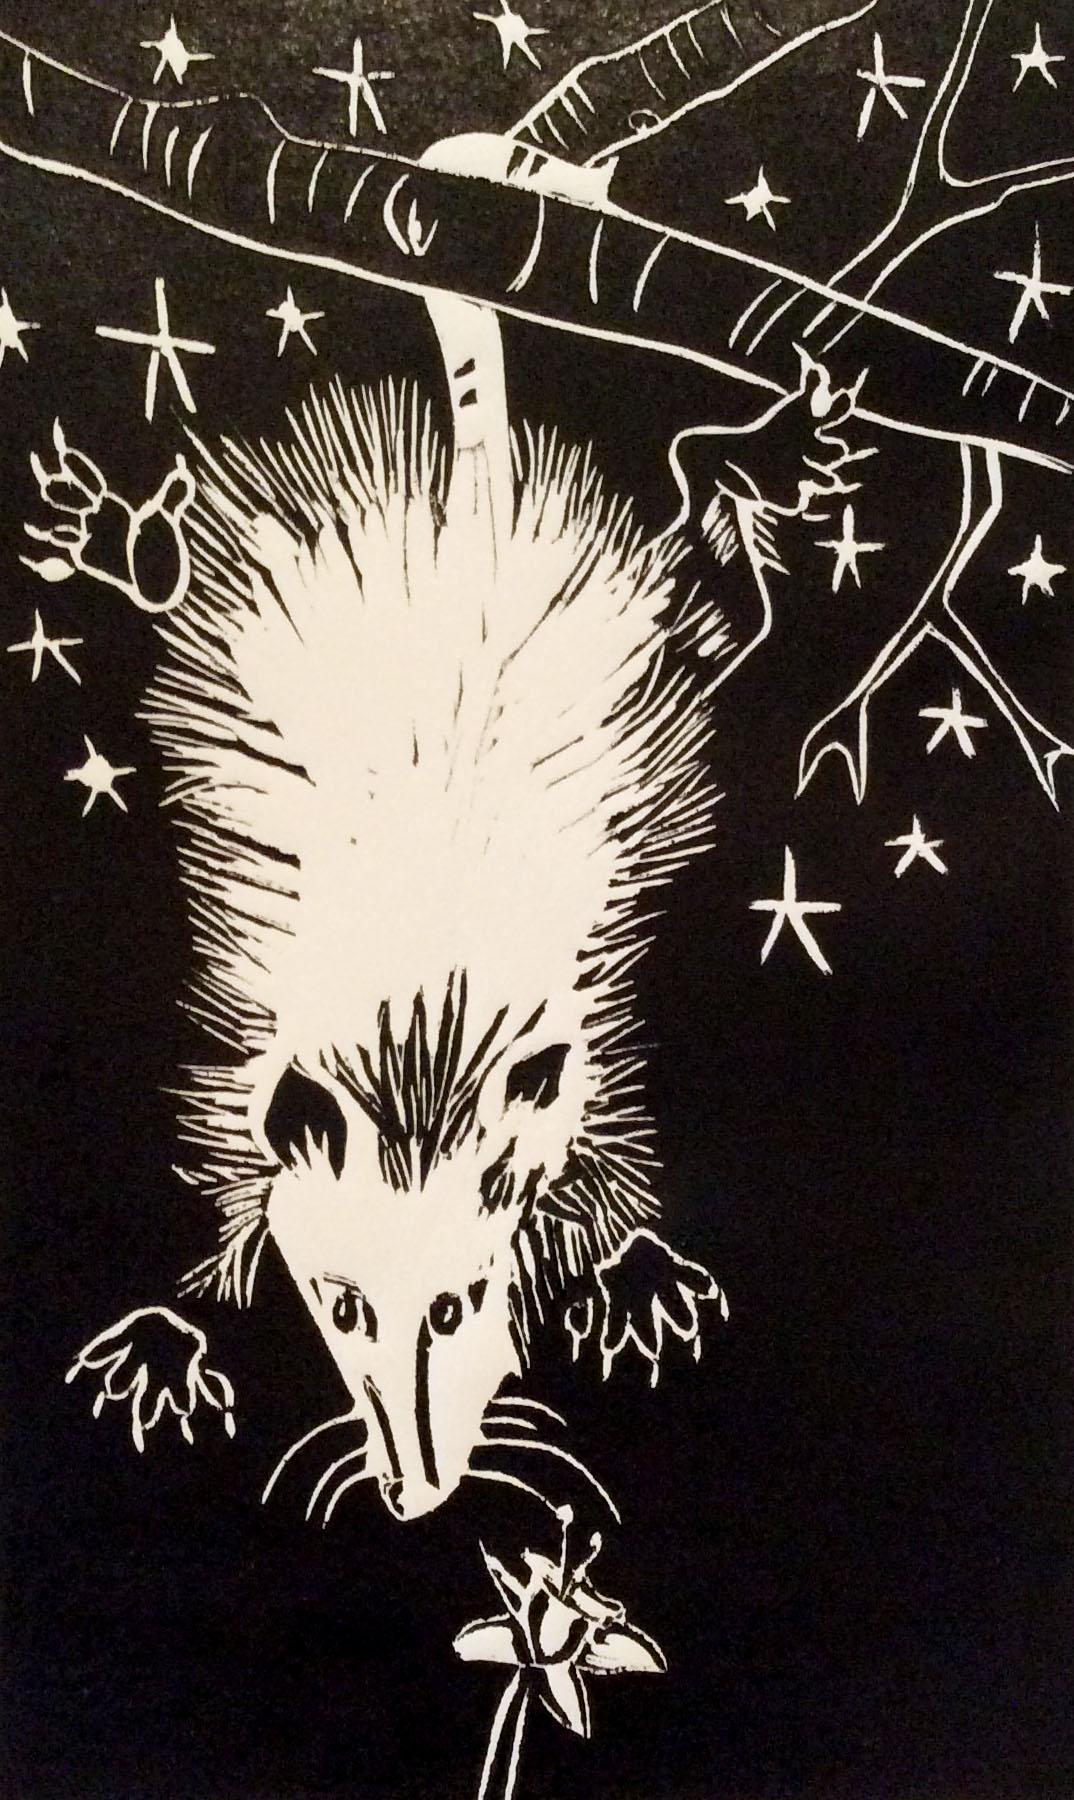 Opossumv1